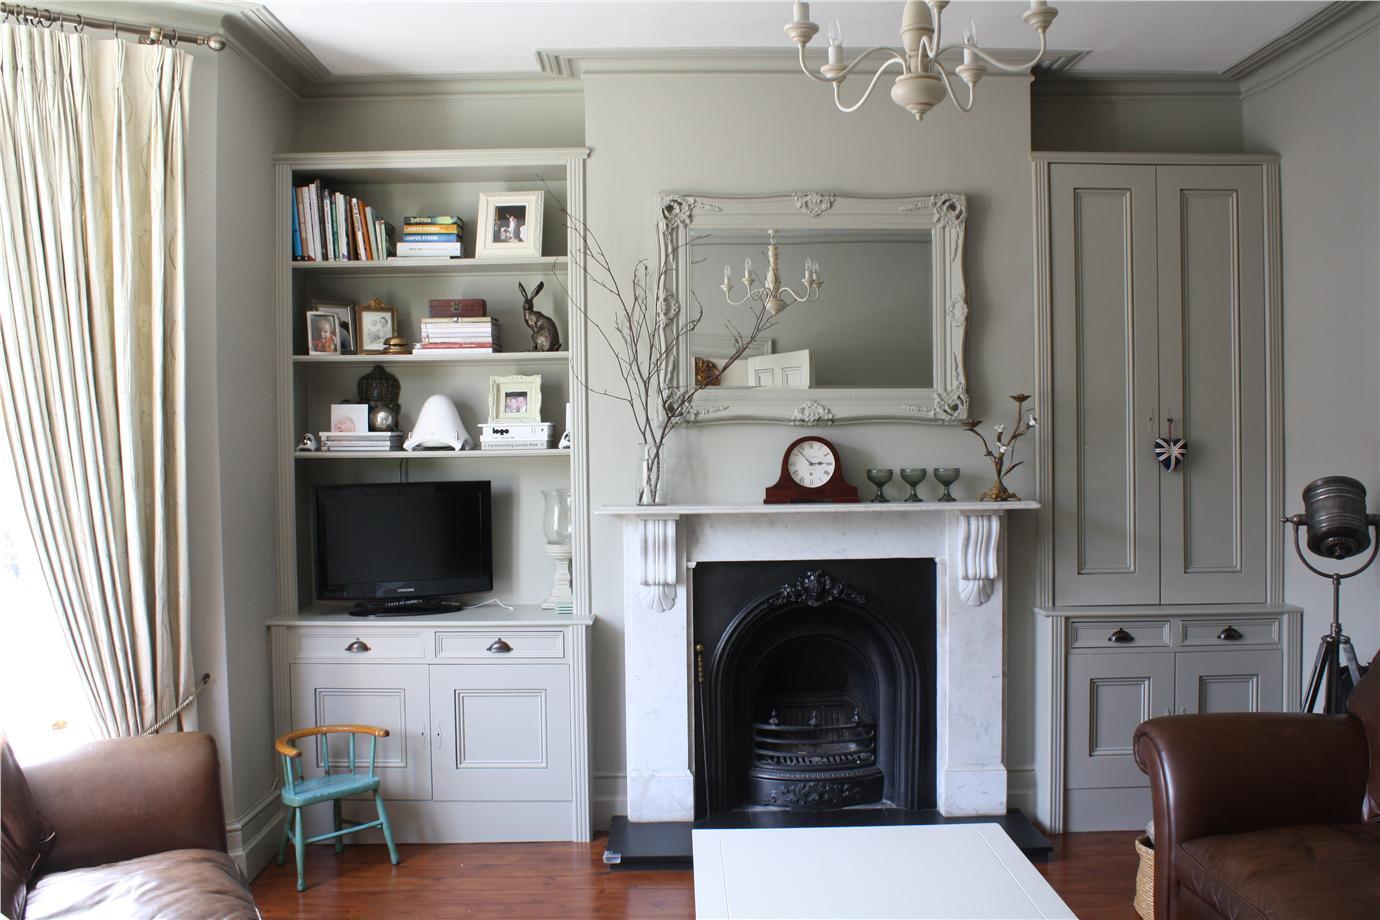 farrow ball hardwick white 5 eparket. Black Bedroom Furniture Sets. Home Design Ideas